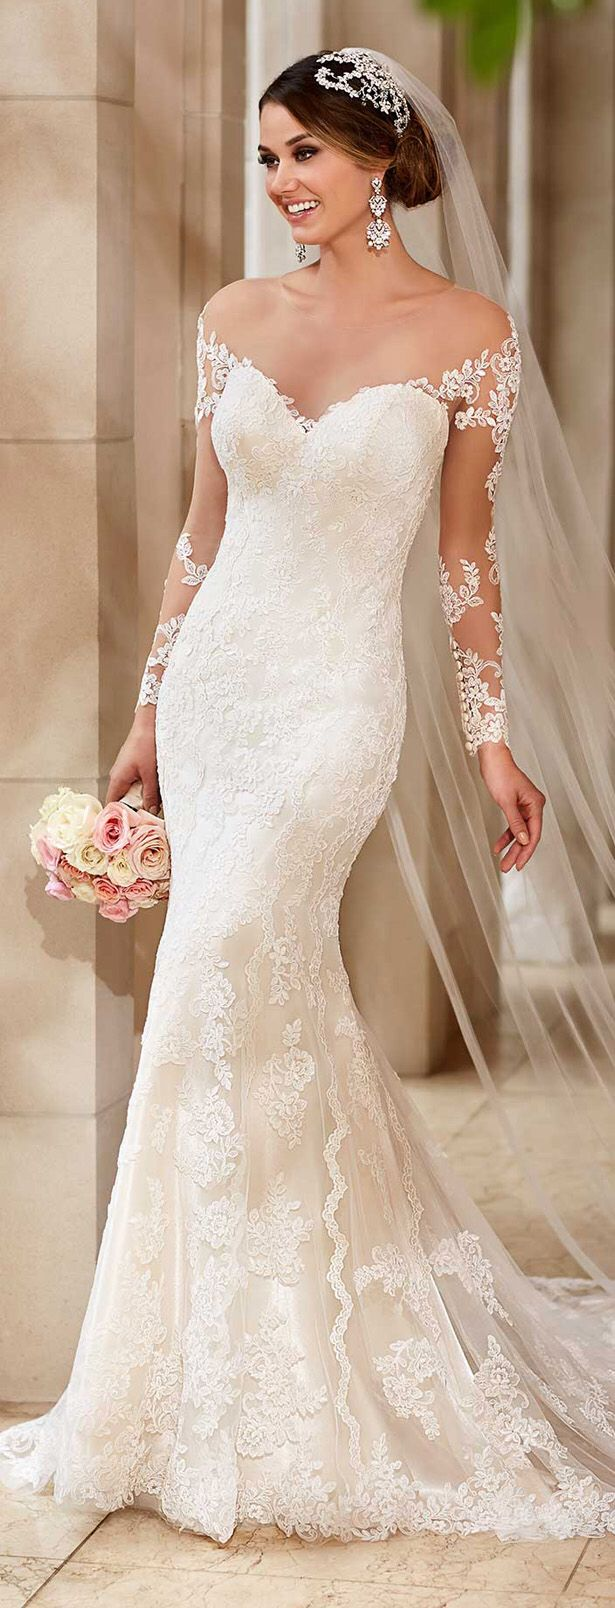 Image from http://bellethemagazine.com/wp-content/uploads/2015/06/stella-york-spring-2016-wedding-dress-6176_alt4_zoom.jpg.